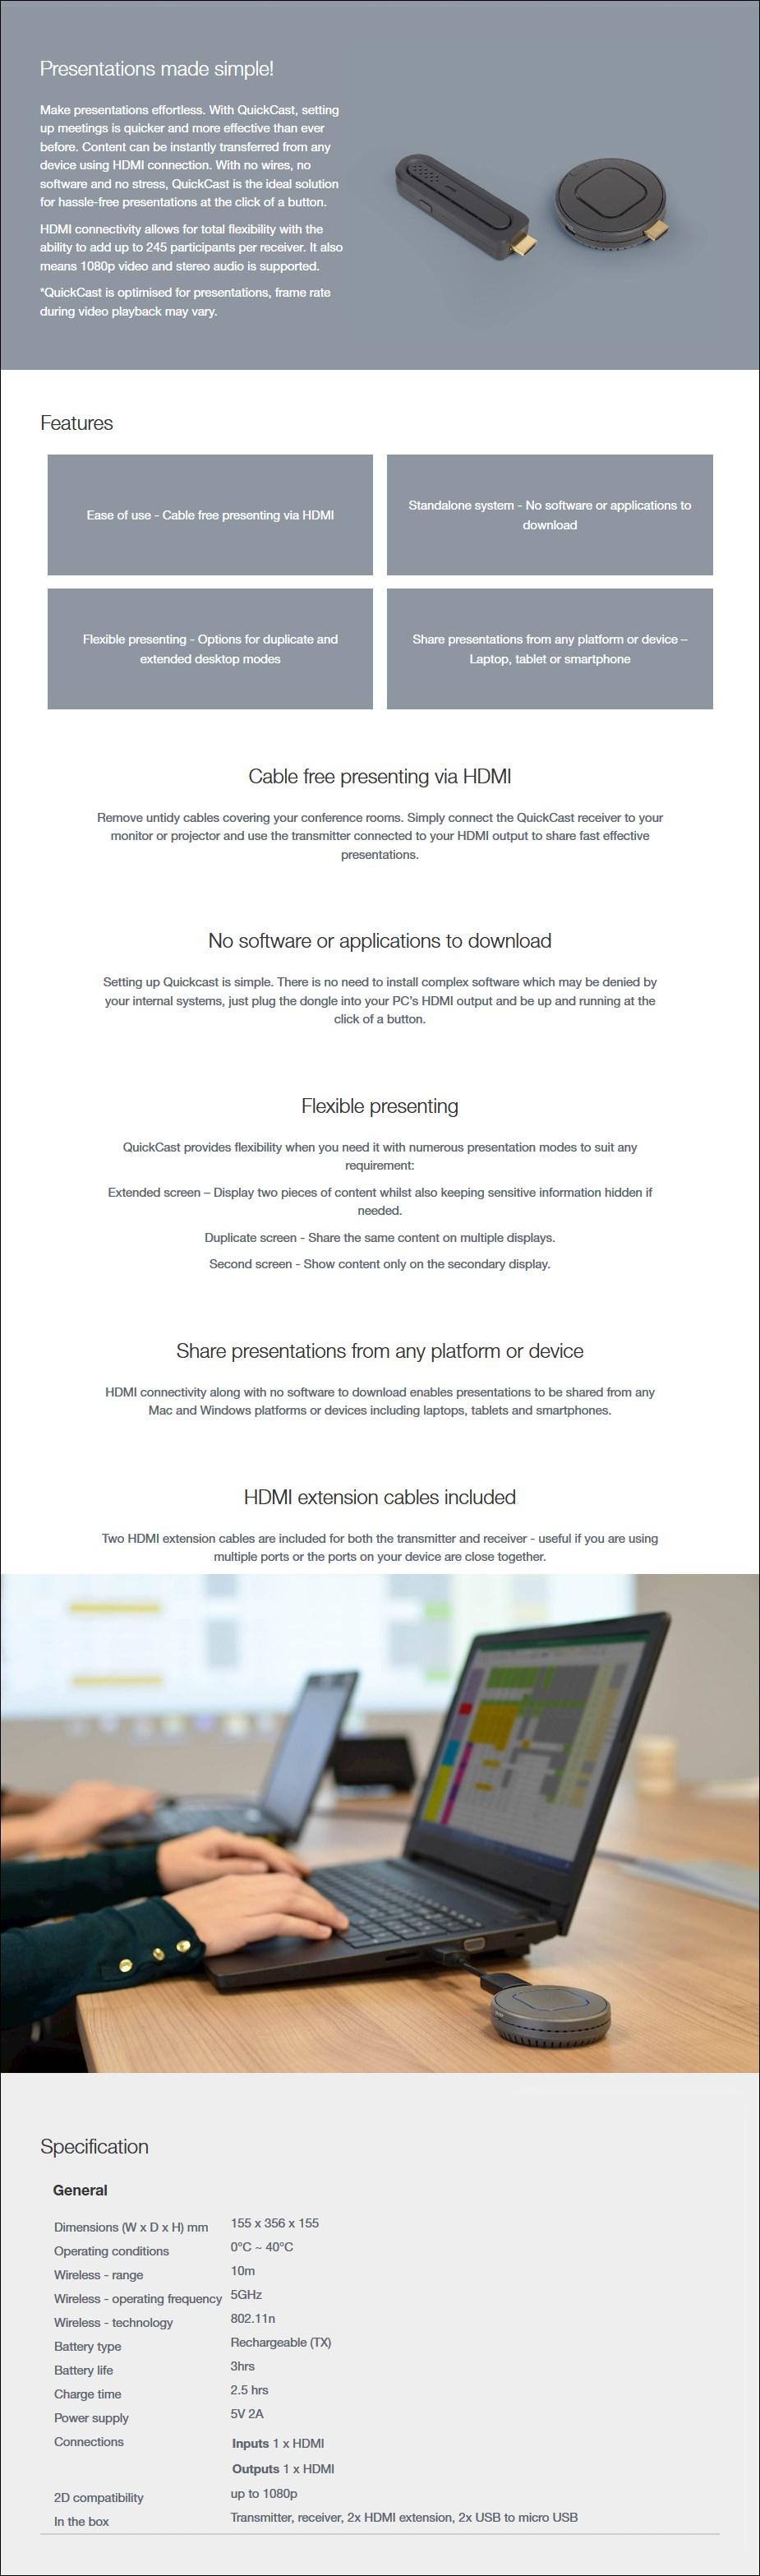 Optoma QuickCast Pro 4K Starter Kit - Overview 1